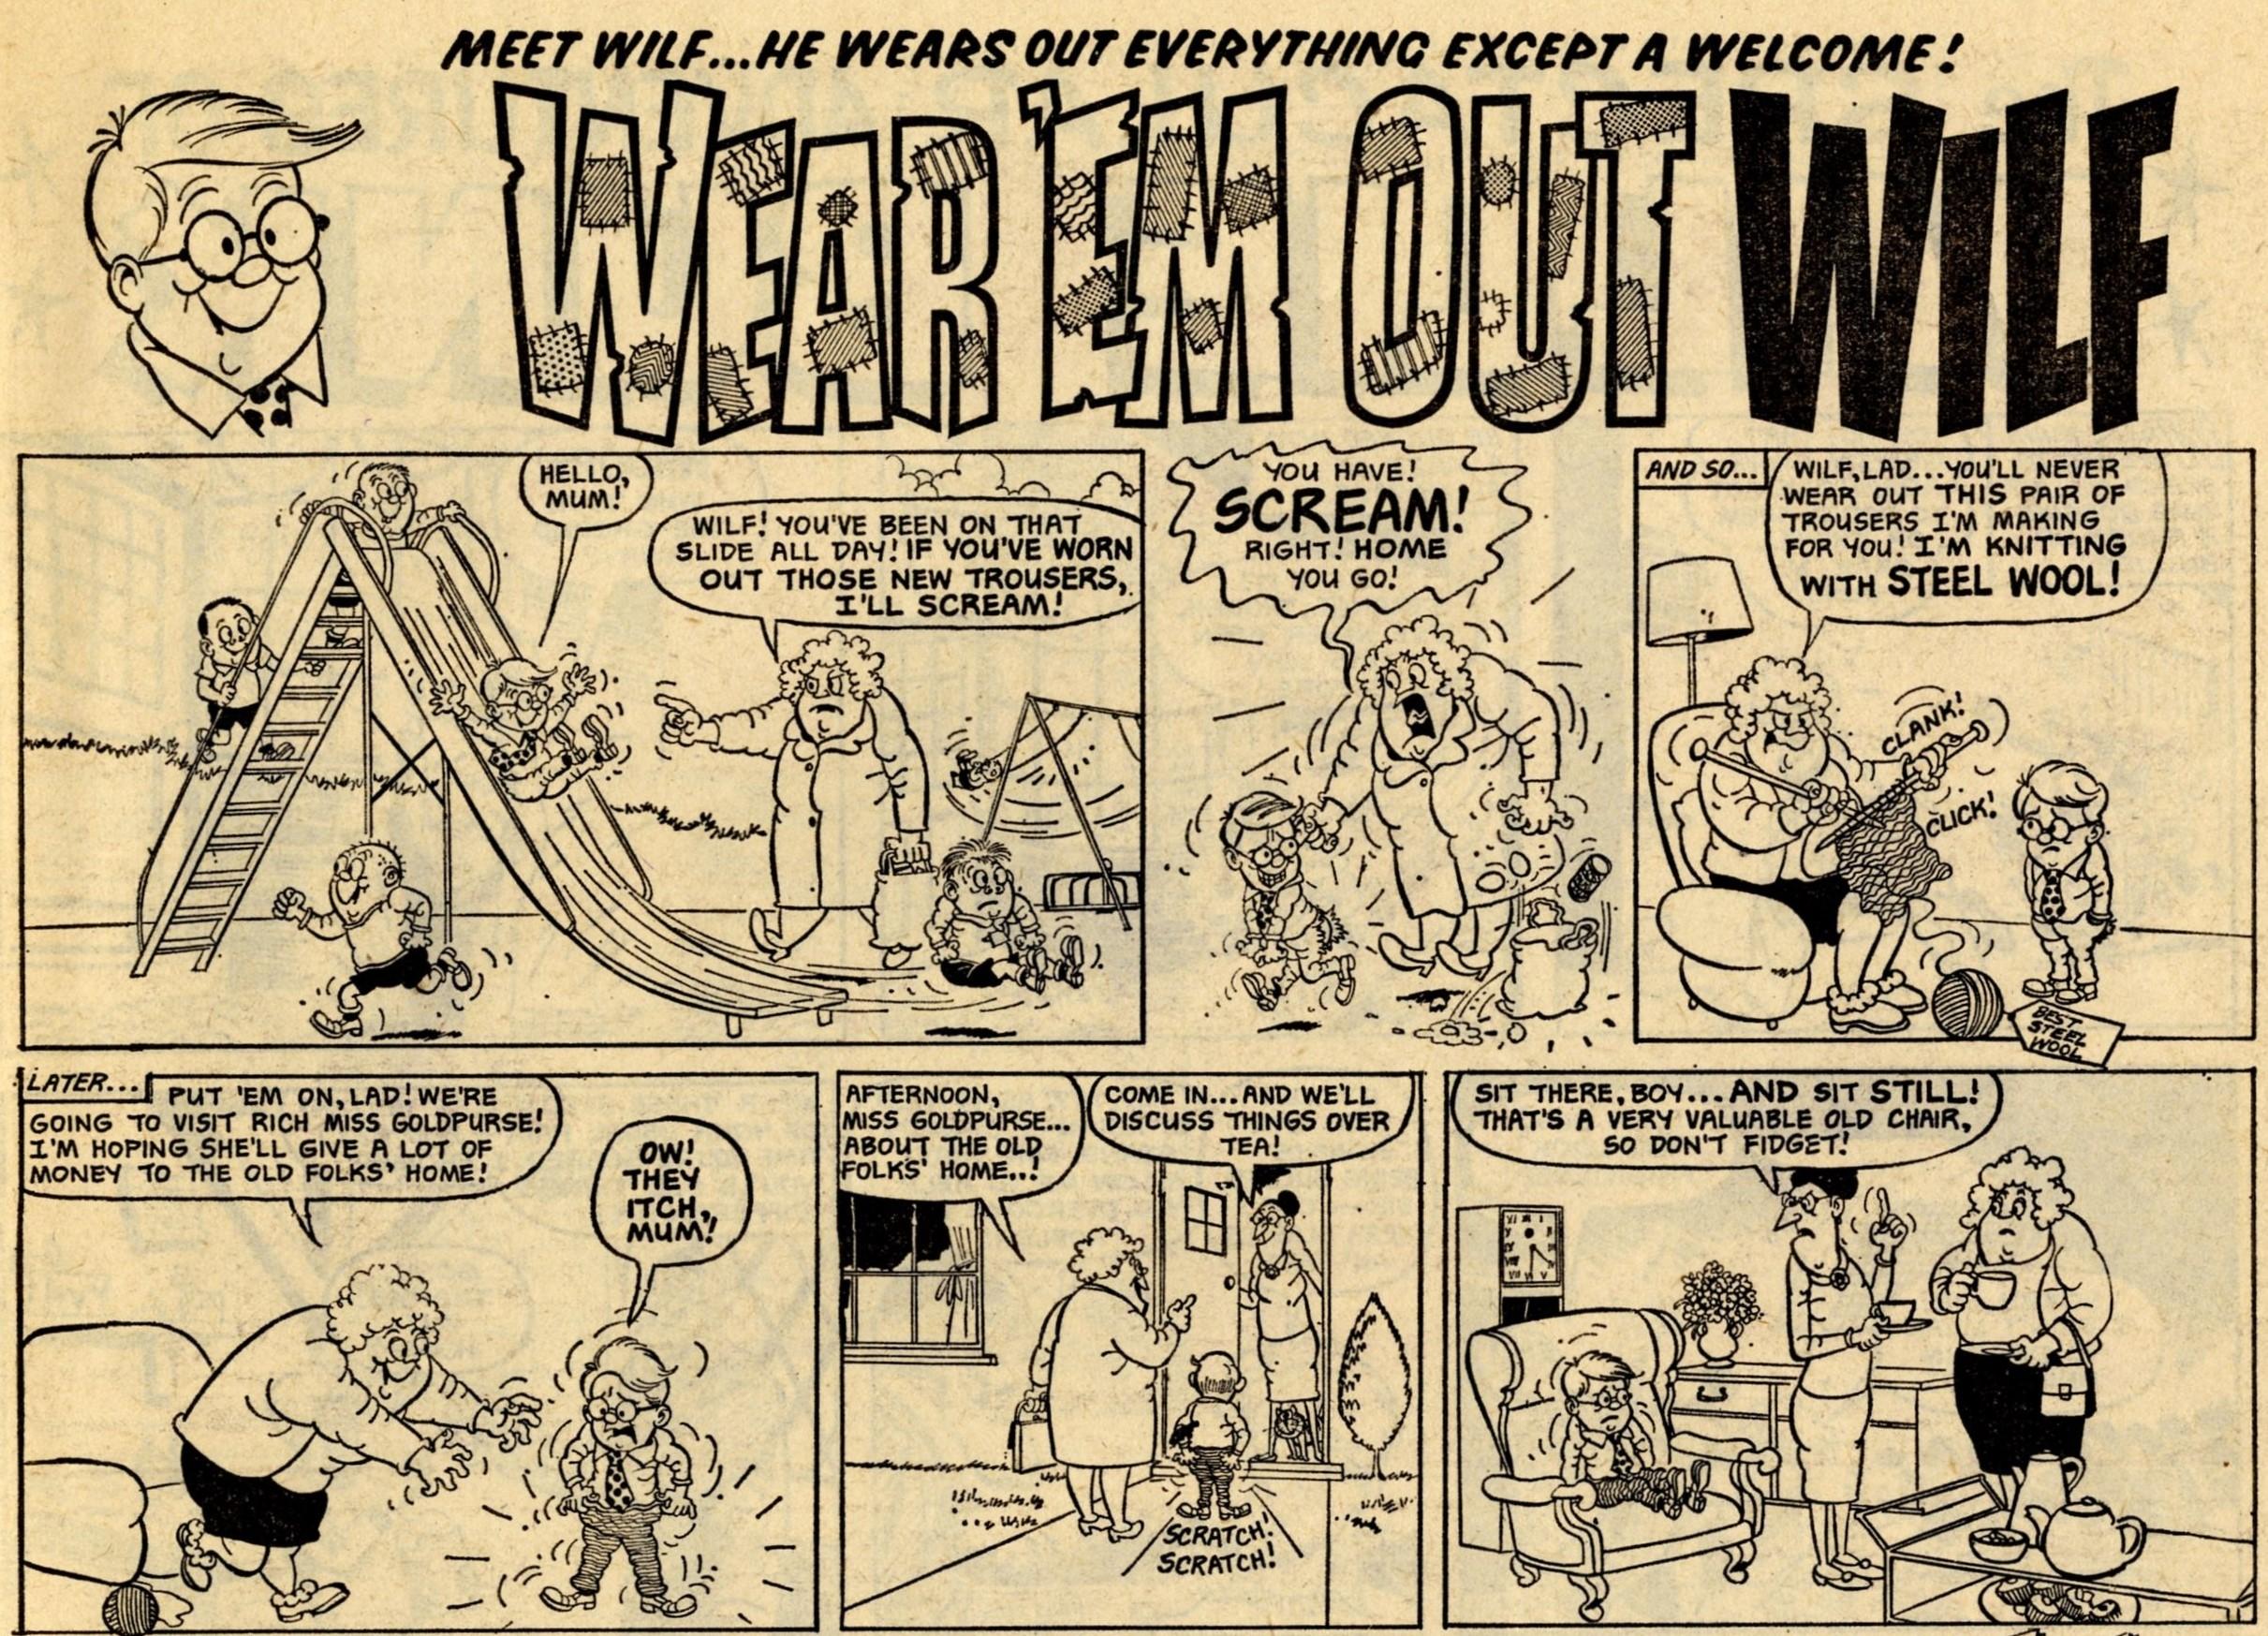 Wear 'Em Out Wilf: Norman Mansbridge (artist)